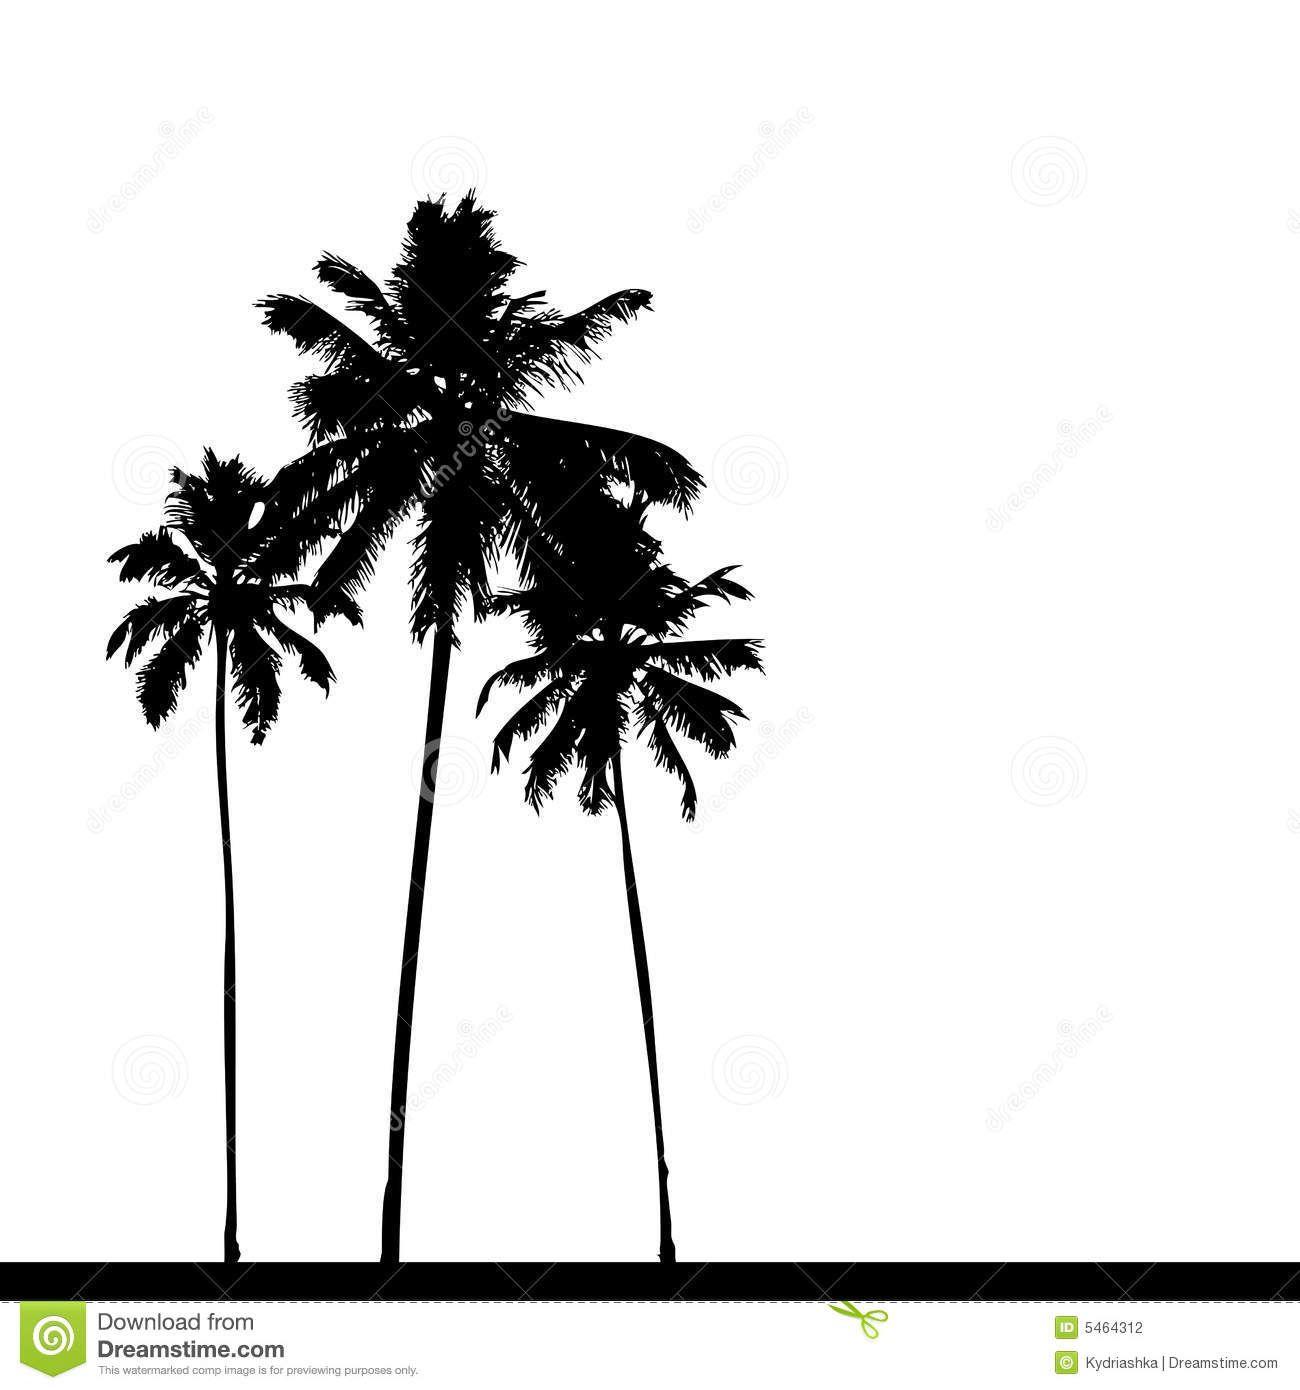 noir-de-silhouette-de-palmier-5464312.jpg (1300×1390)